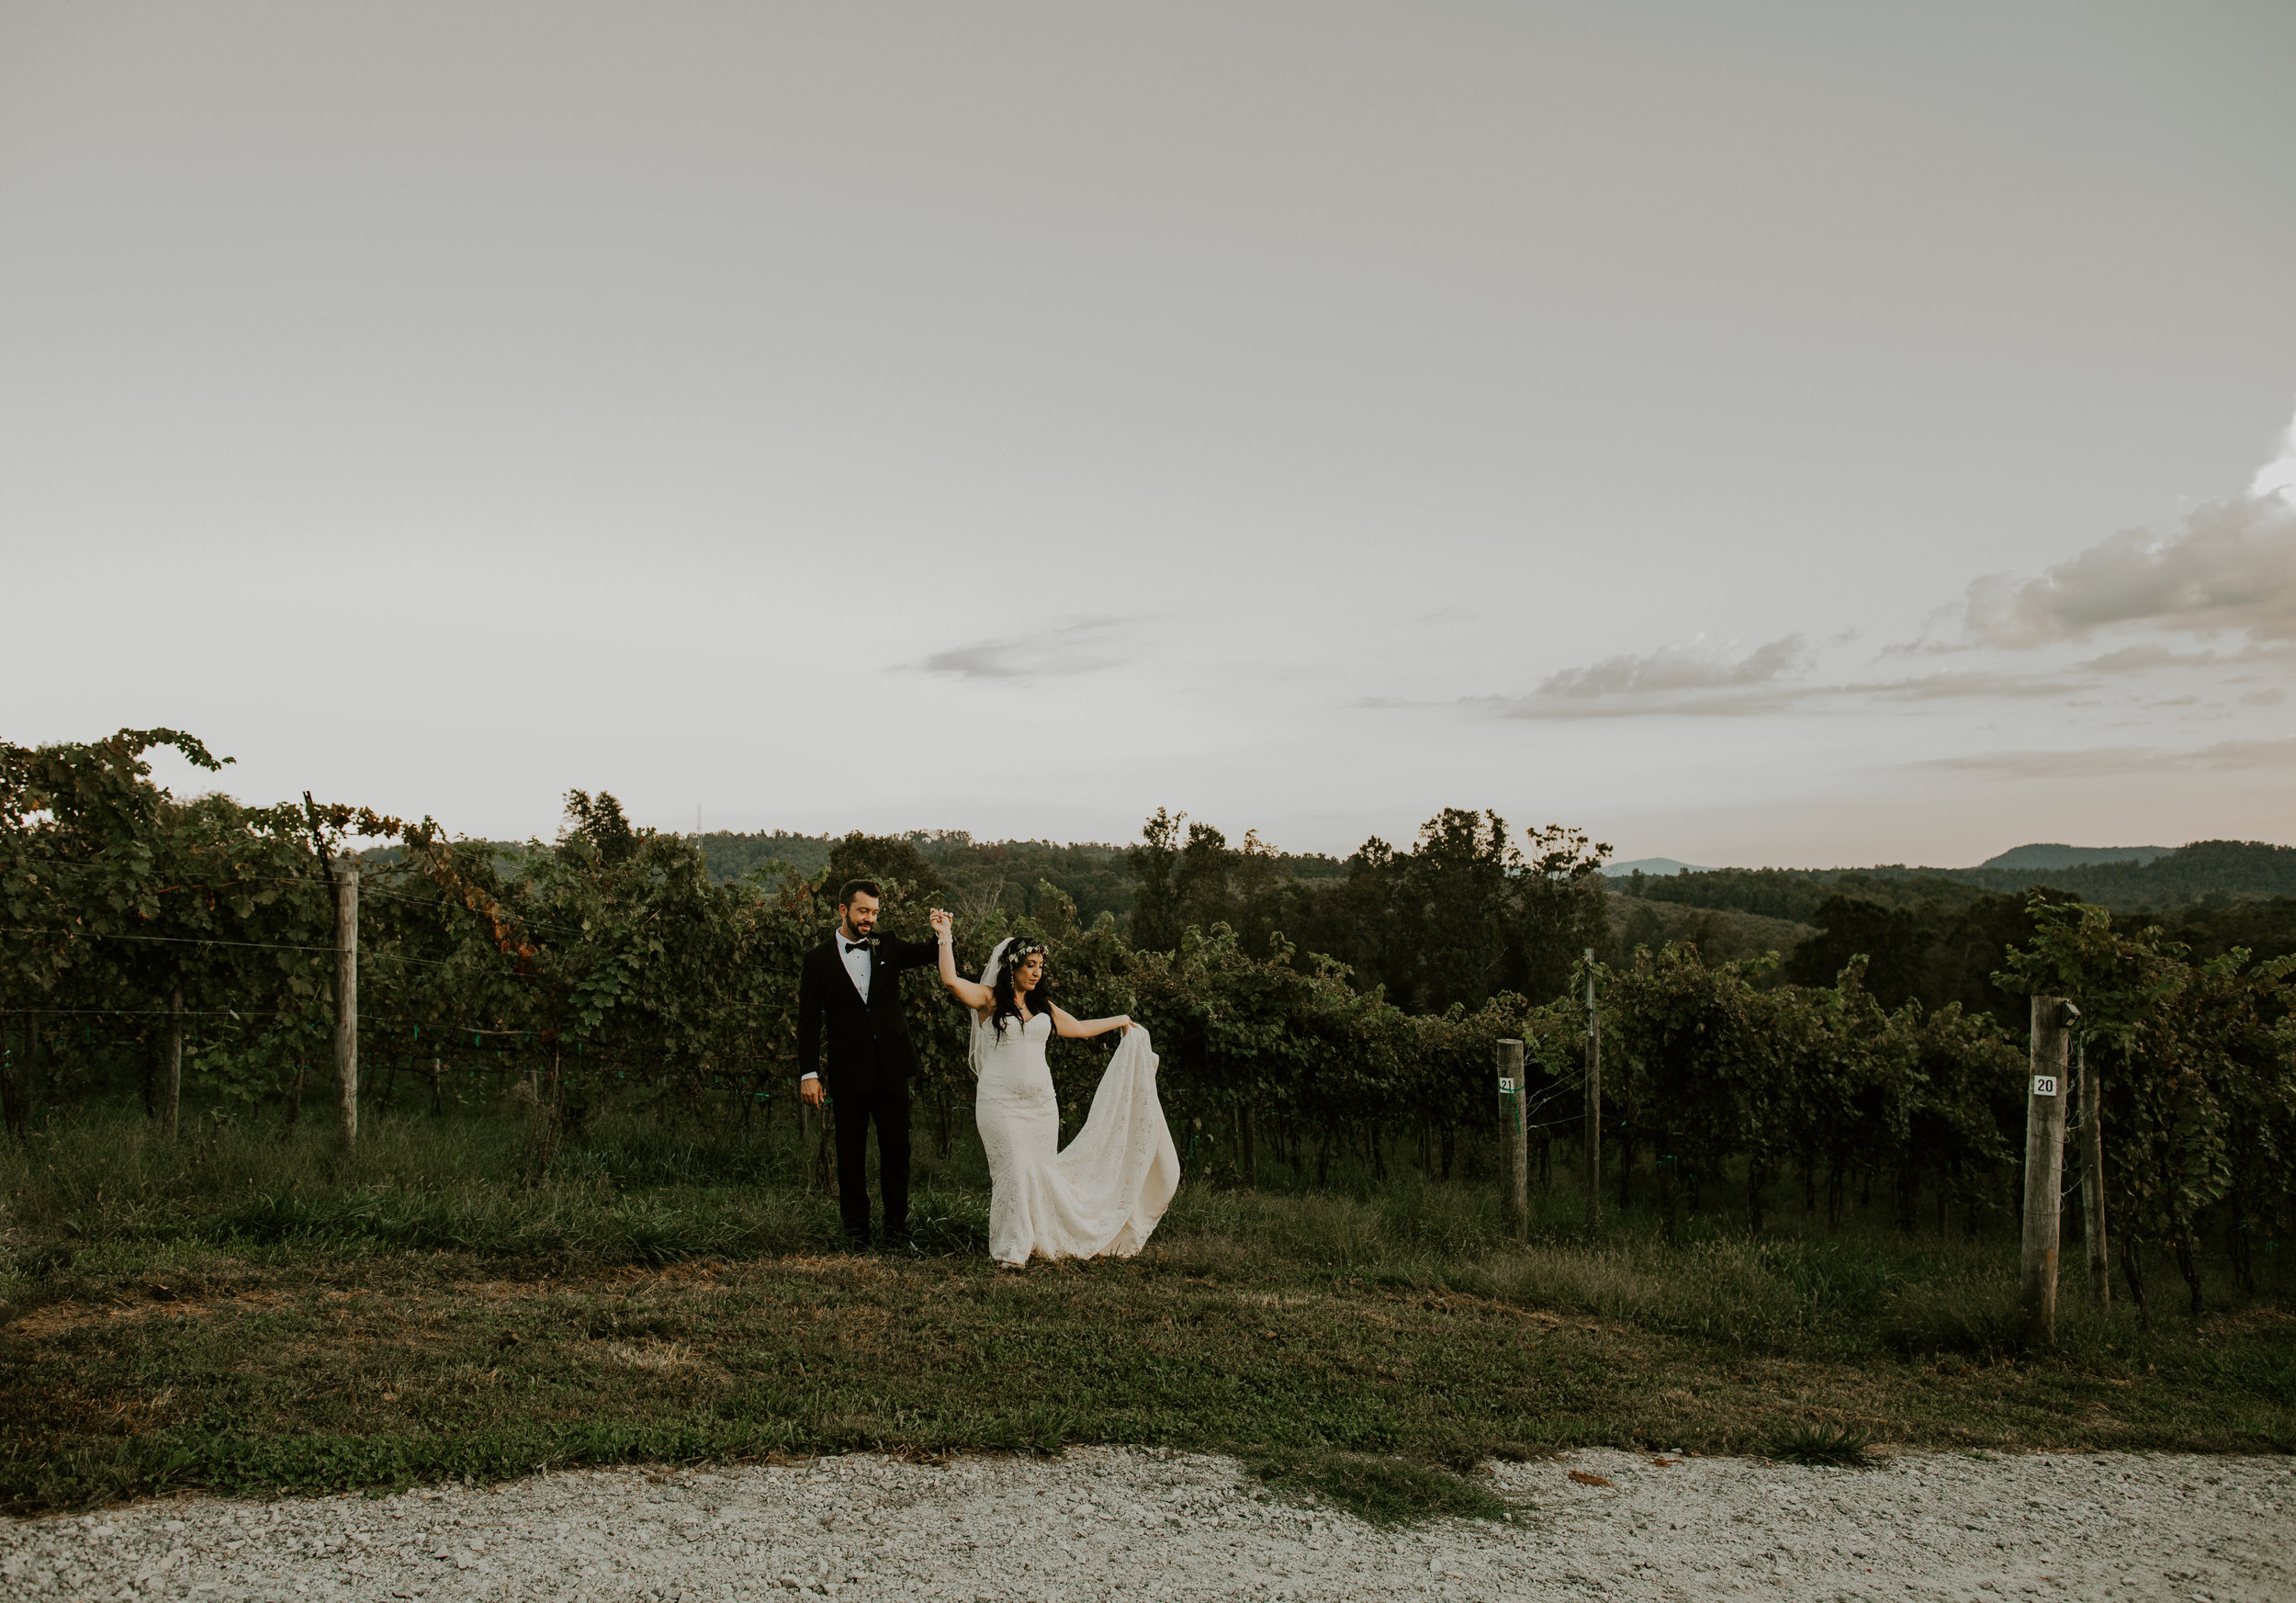 Point Lookout Vineyards Hendersonville North Carolina -Wedding-Renee and Jason-79.JPG